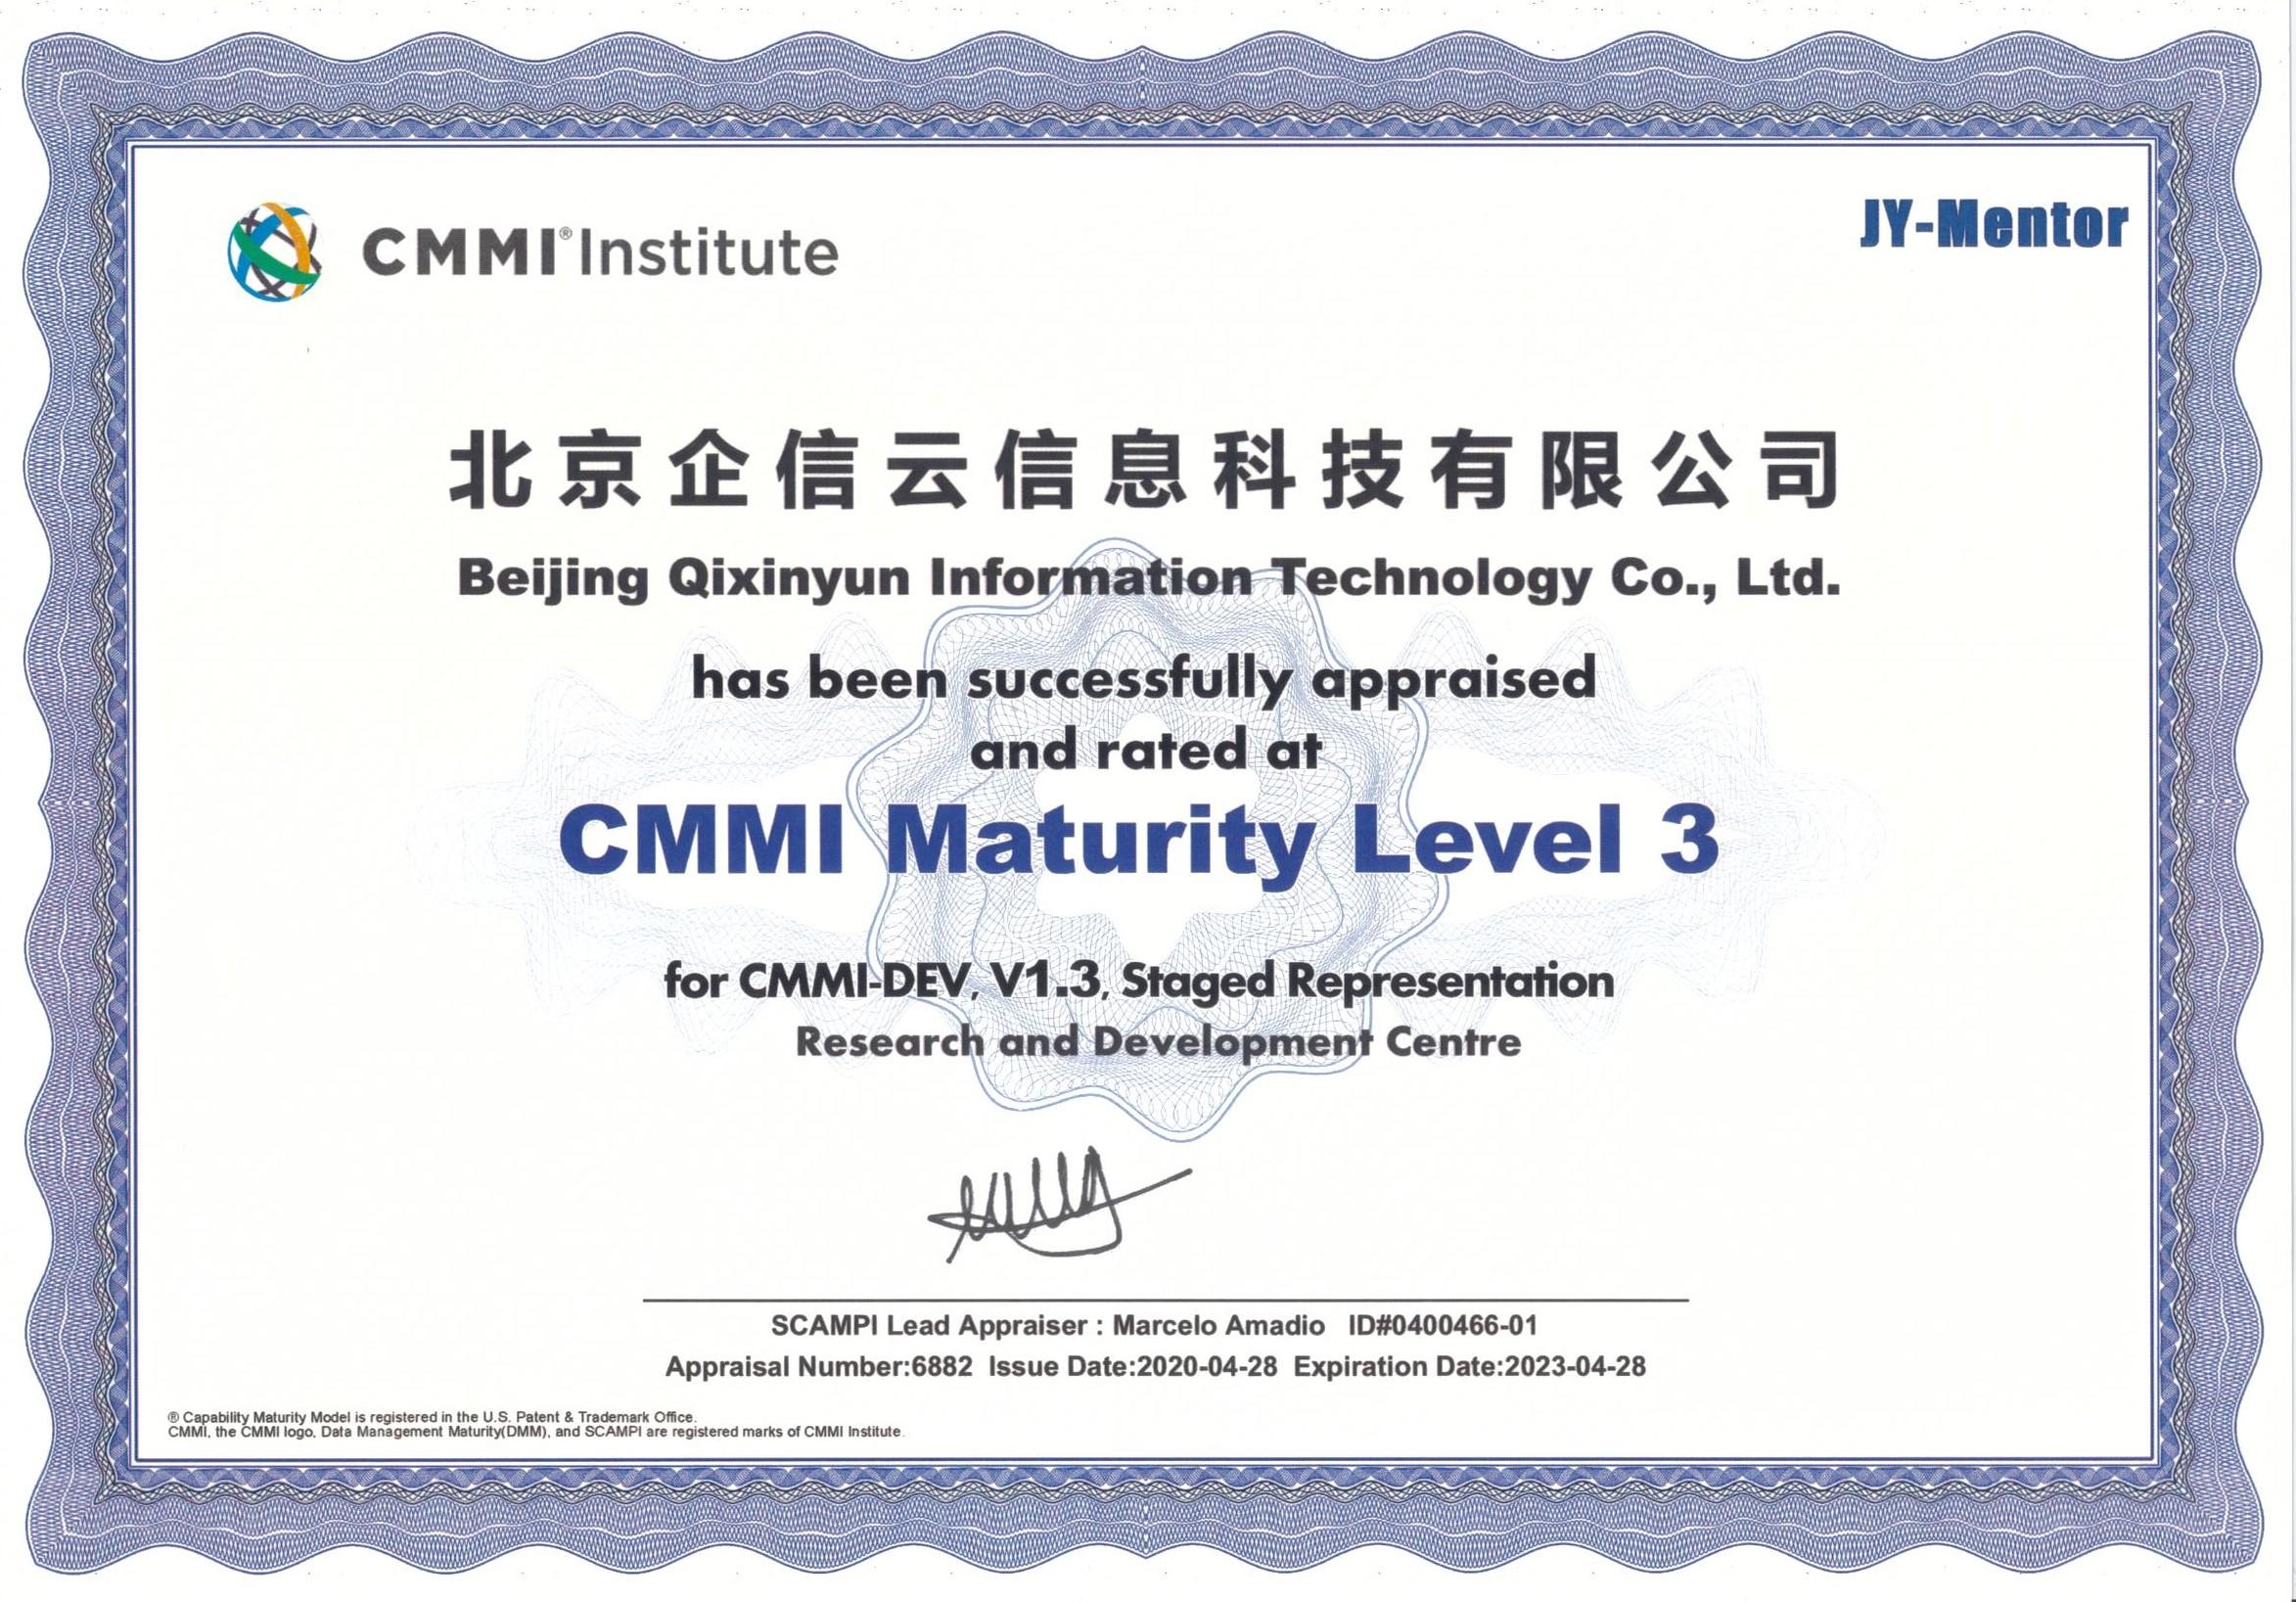 CMMI是英文Capability Maturity Model Integration的缩写。CMMI认证简称软件能力成熟度集成模型,是鉴定企业在开发流程化和质量管理上的国际通行标准,全球软件生产标准大都以此为基点,并都努力争取成为CMMI认证队伍中的一分子。 对一个软件企业来说,达到CMMI2就基本上进入了规模开发,基本具备了一个现代化软件企业的基本架构和方法,具备了承接外包项目的能力。CMMI3评估则需要对大软件集成的把握,包括整体架构的整合。一般来说,通过CMMI认证的级别越高,其越容易获得用户的信任,在国内、国际市场上的竞争力也就越强。